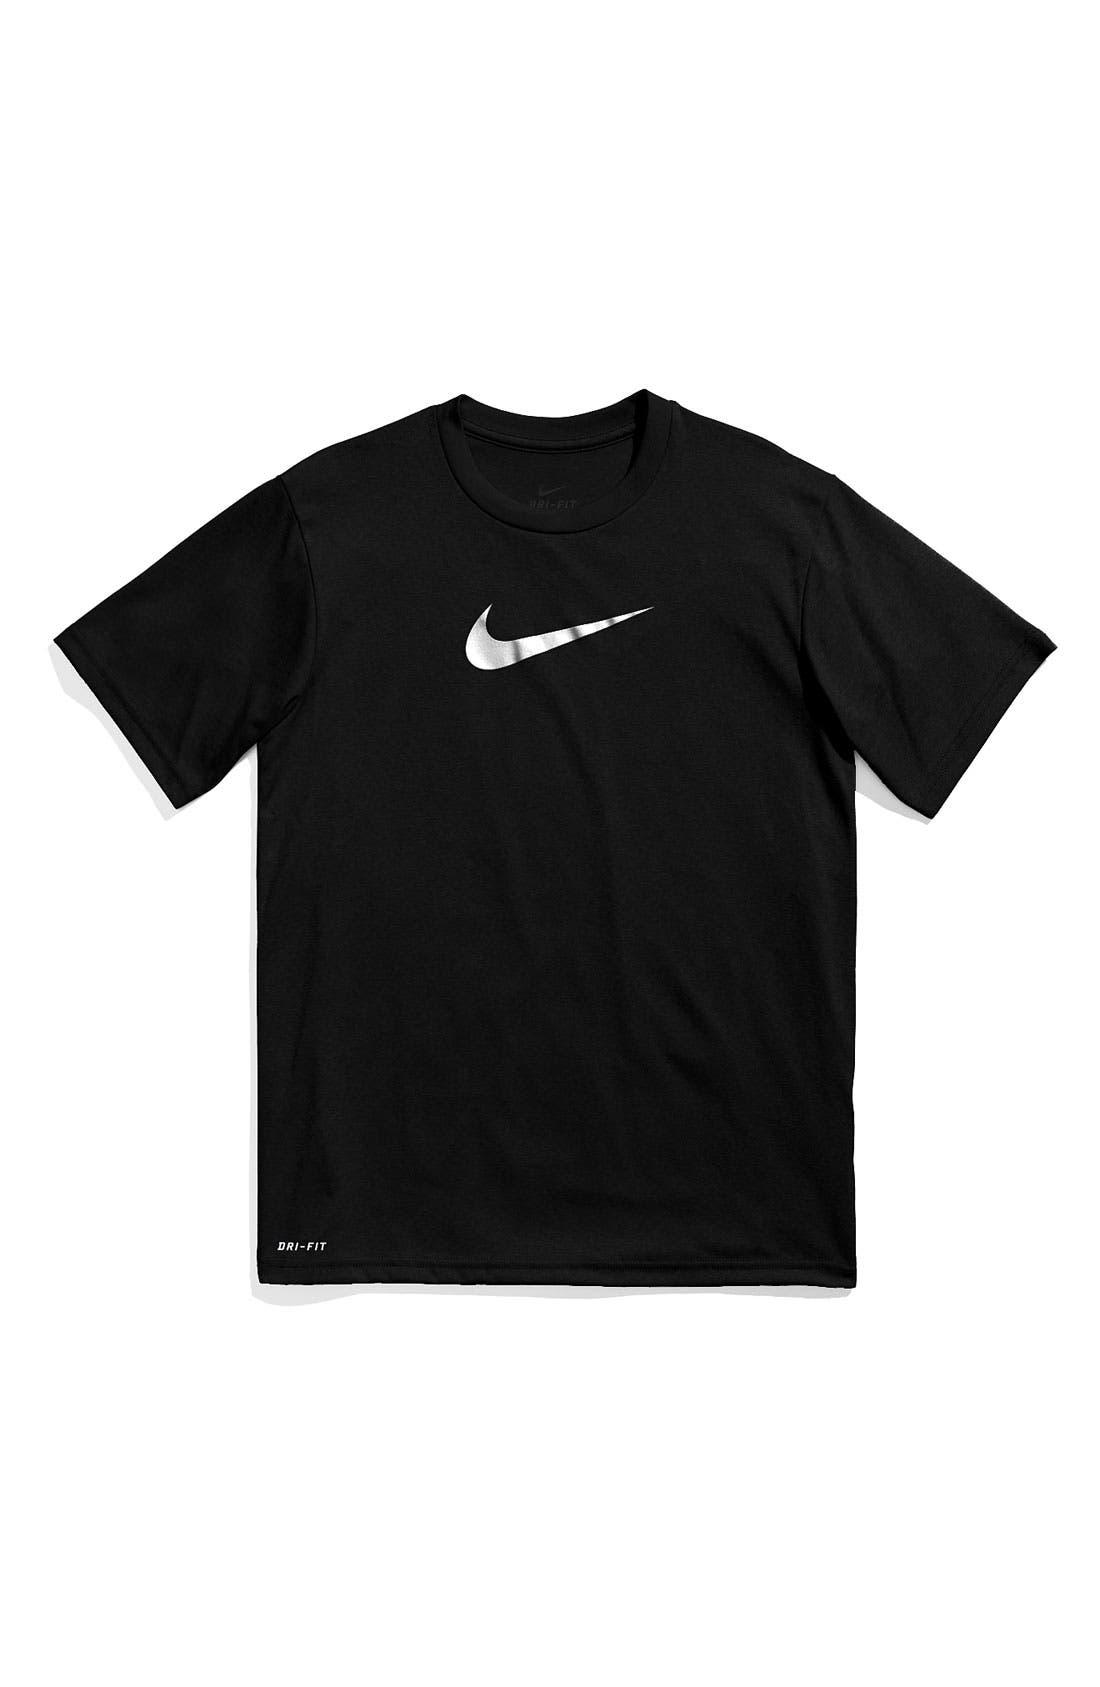 Alternate Image 1 Selected - Nike Dri-FIT Crewneck T-Shirt (Big Boys)